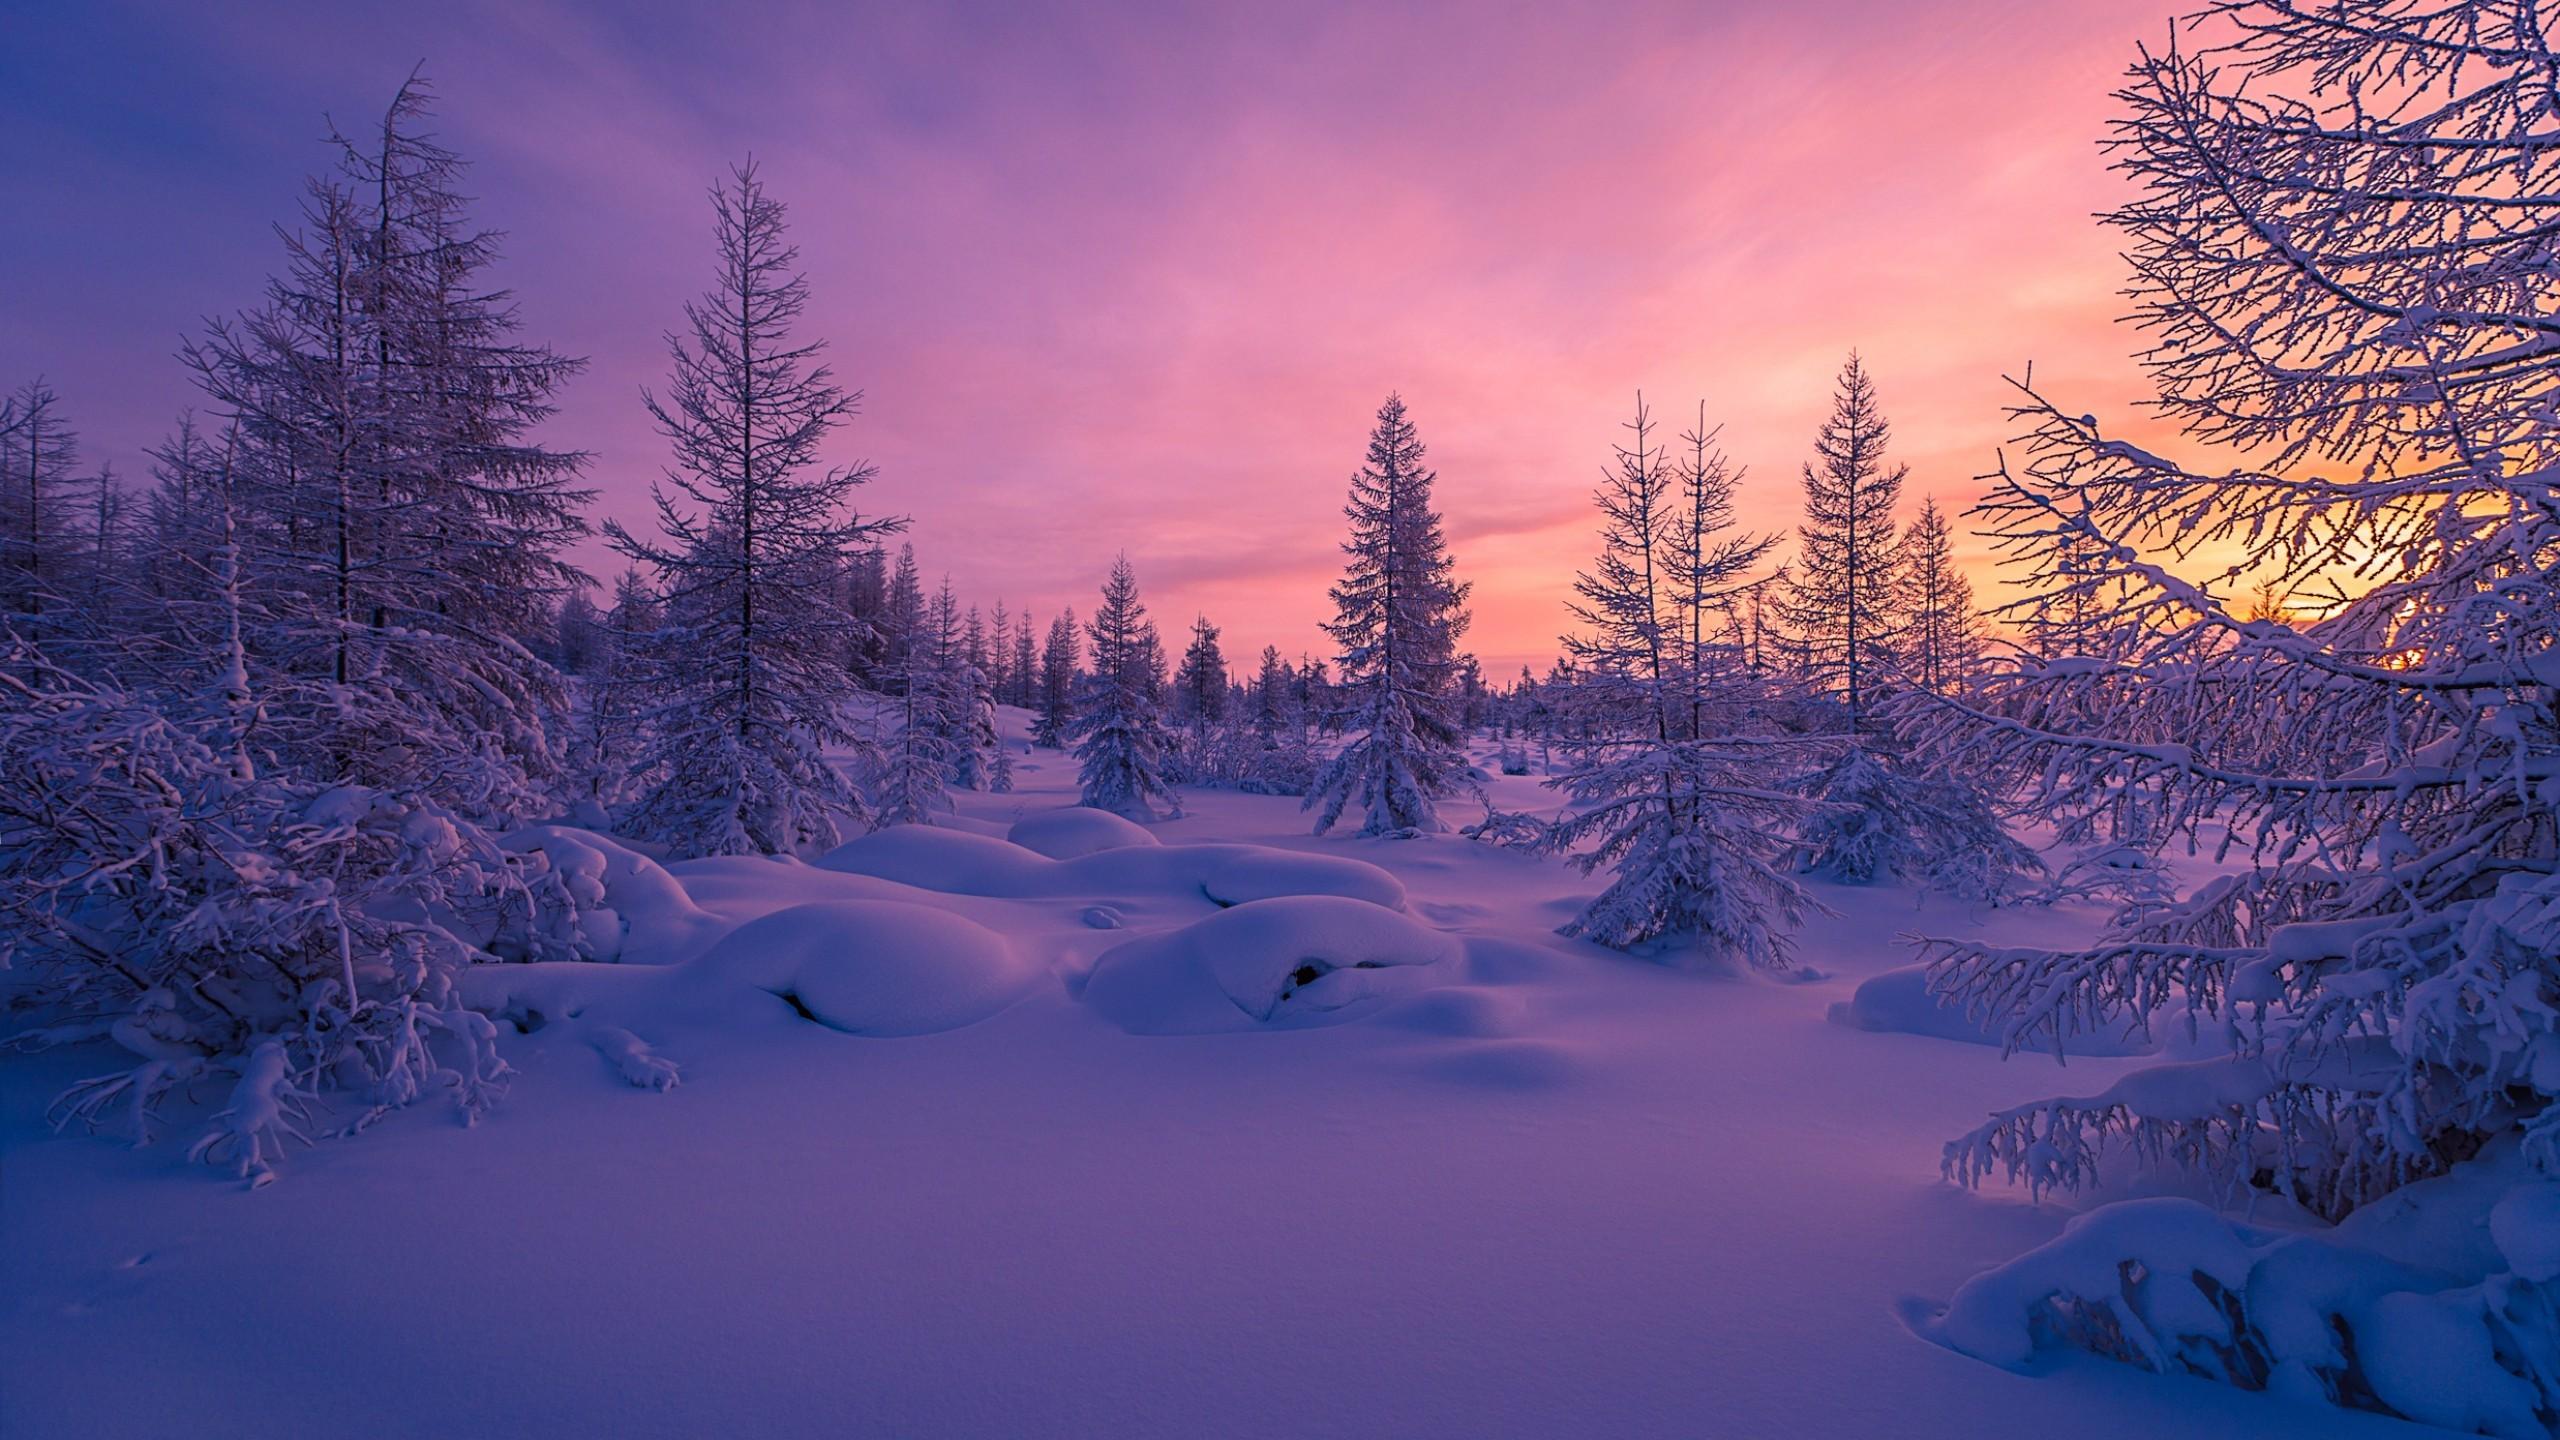 Nature / Winter forest Wallpaper